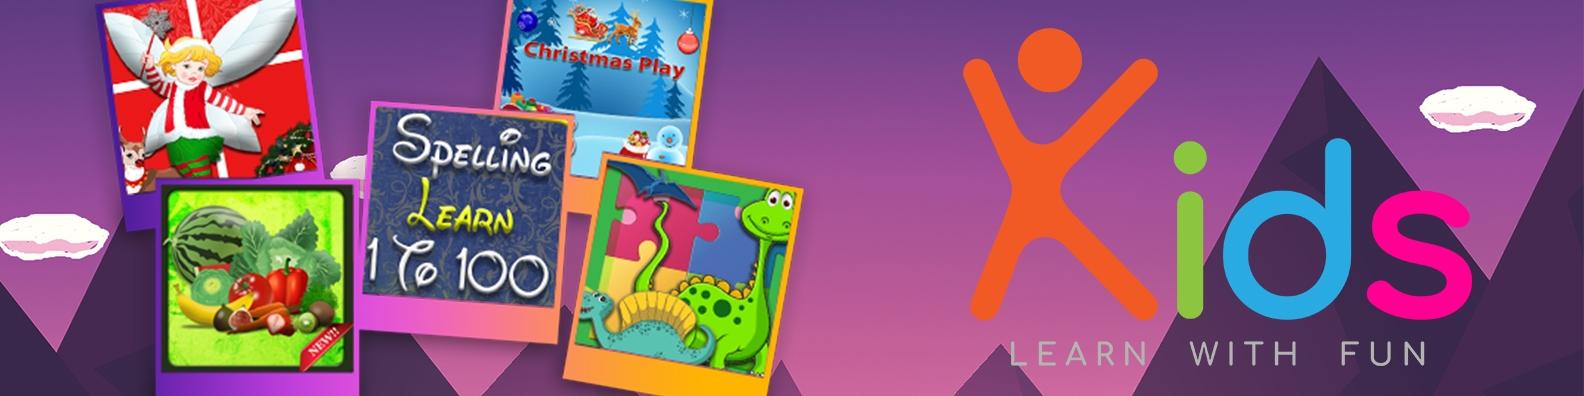 kidslearnwithfun (@kidslearnwithfun) Cover Image